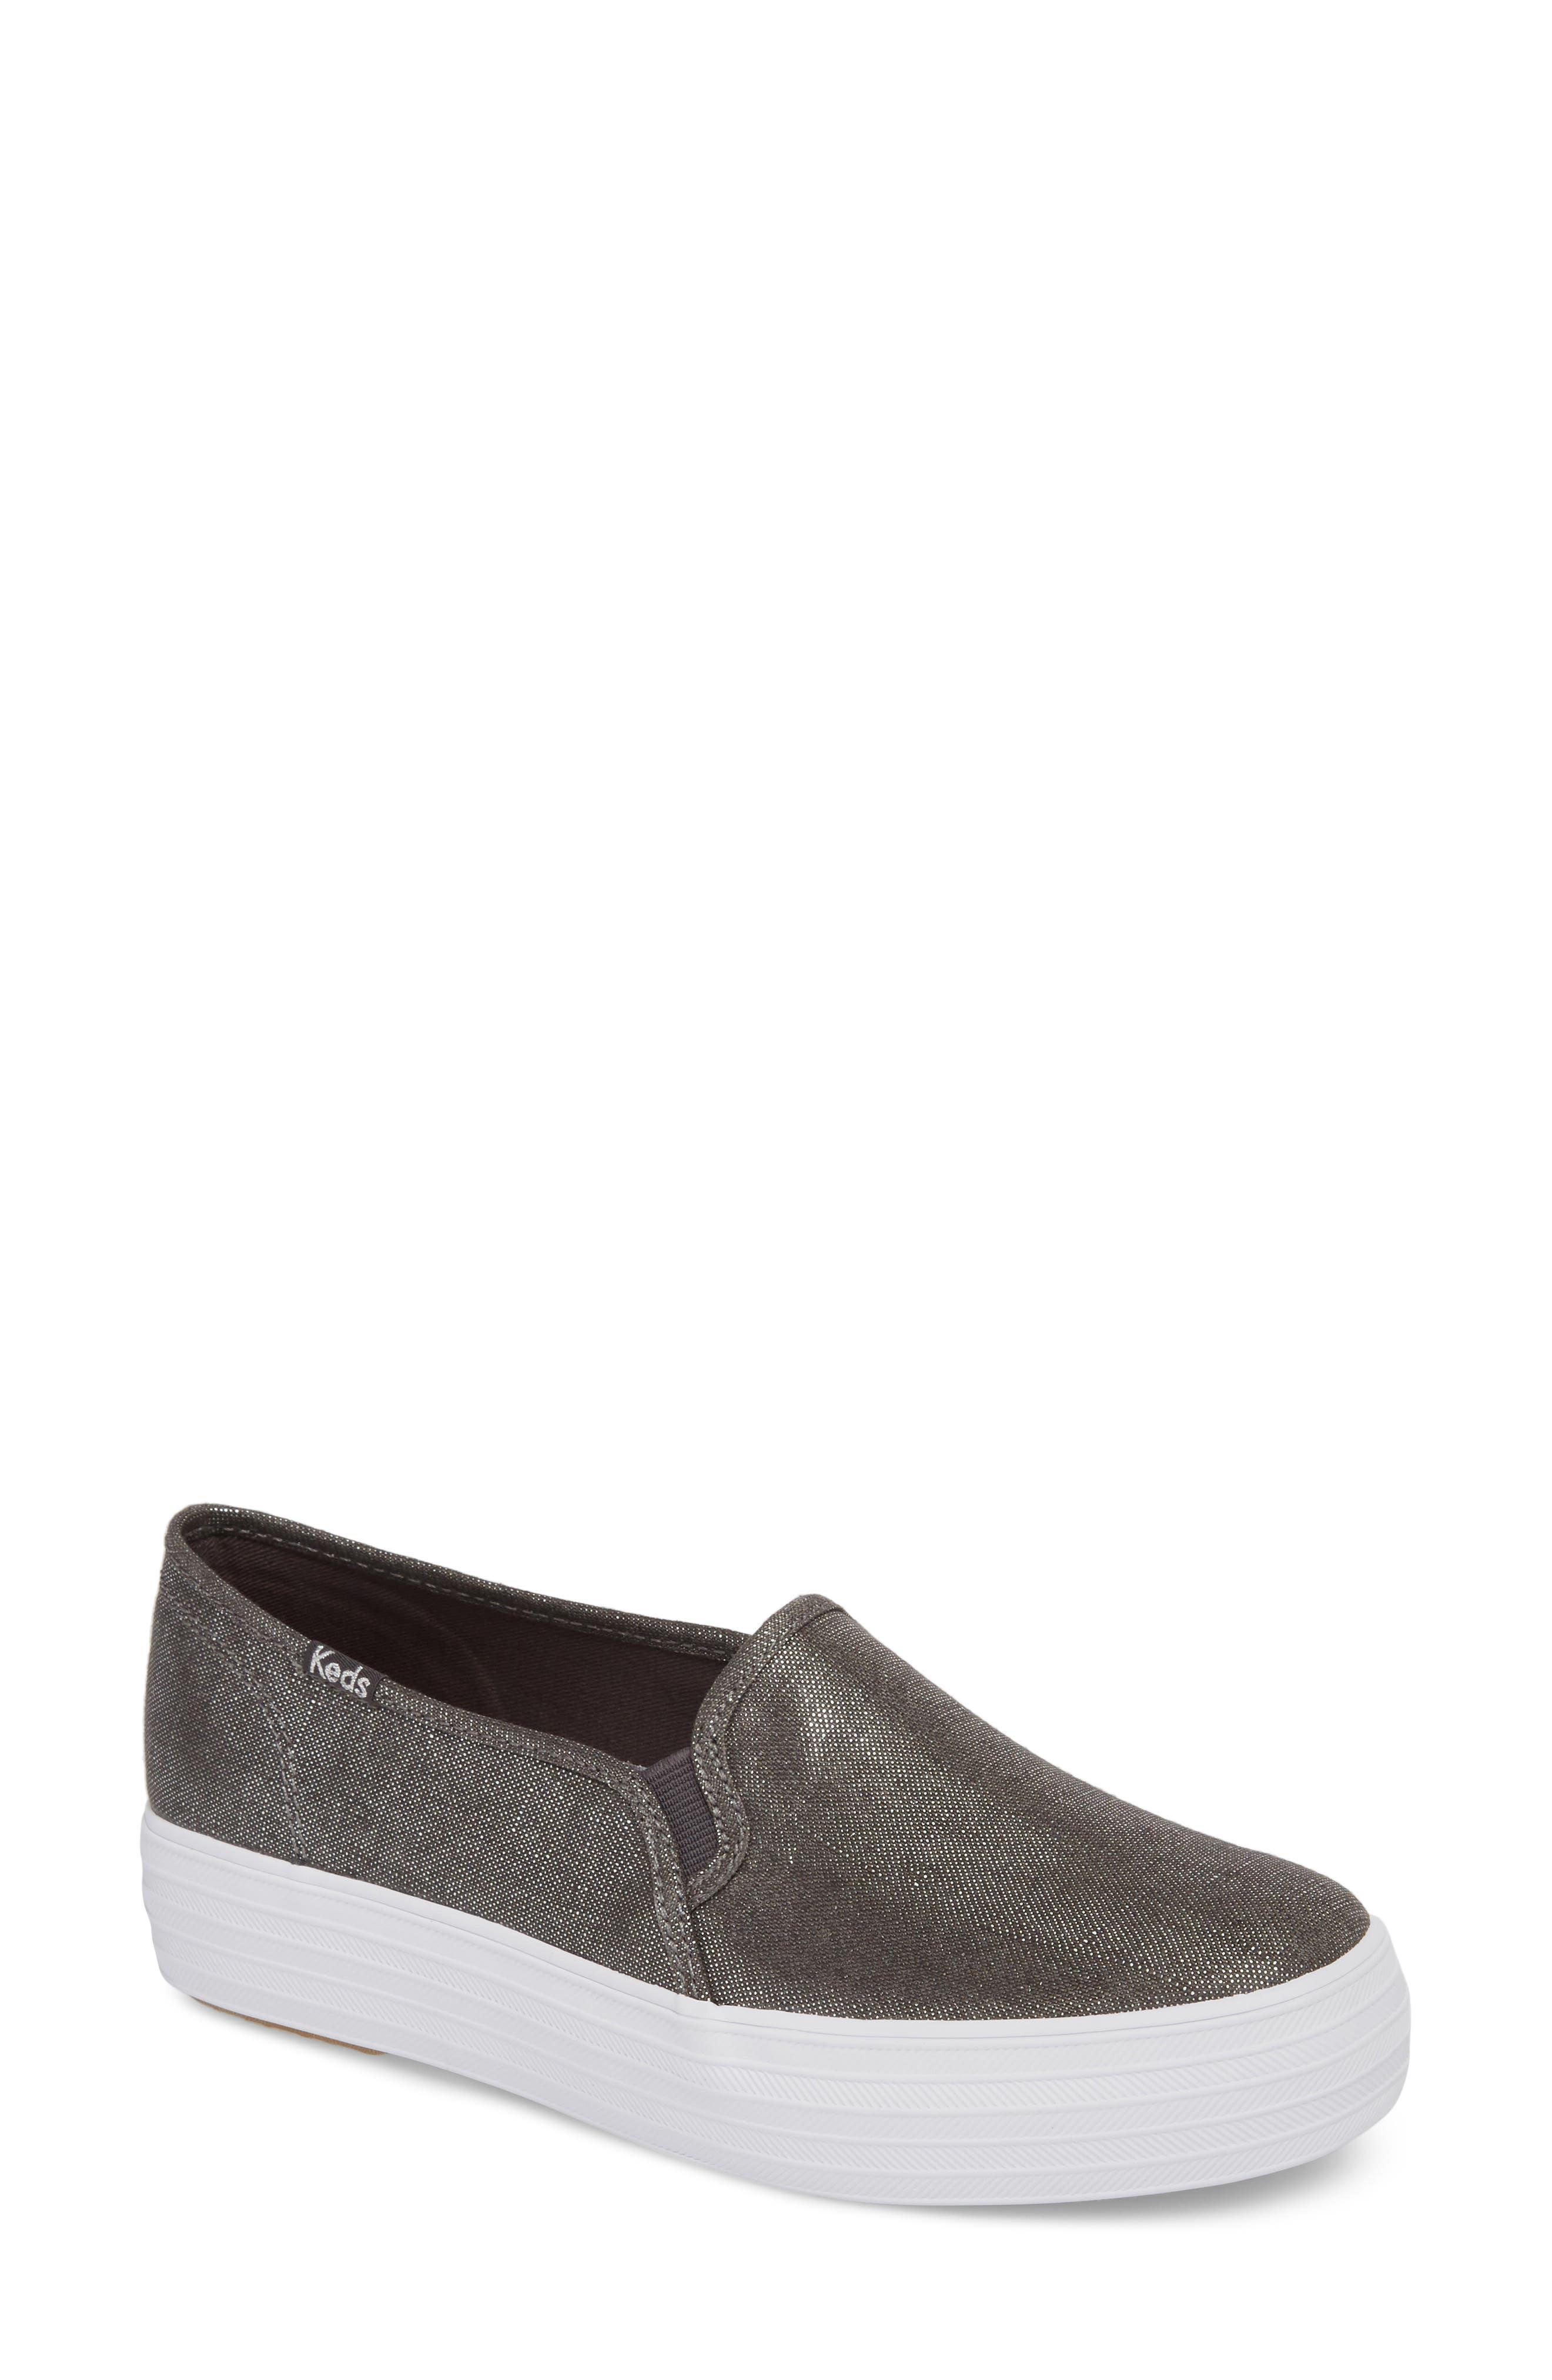 Triple Decker Metallic Linen Slip-On Sneaker,                         Main,                         color, Gunmetal